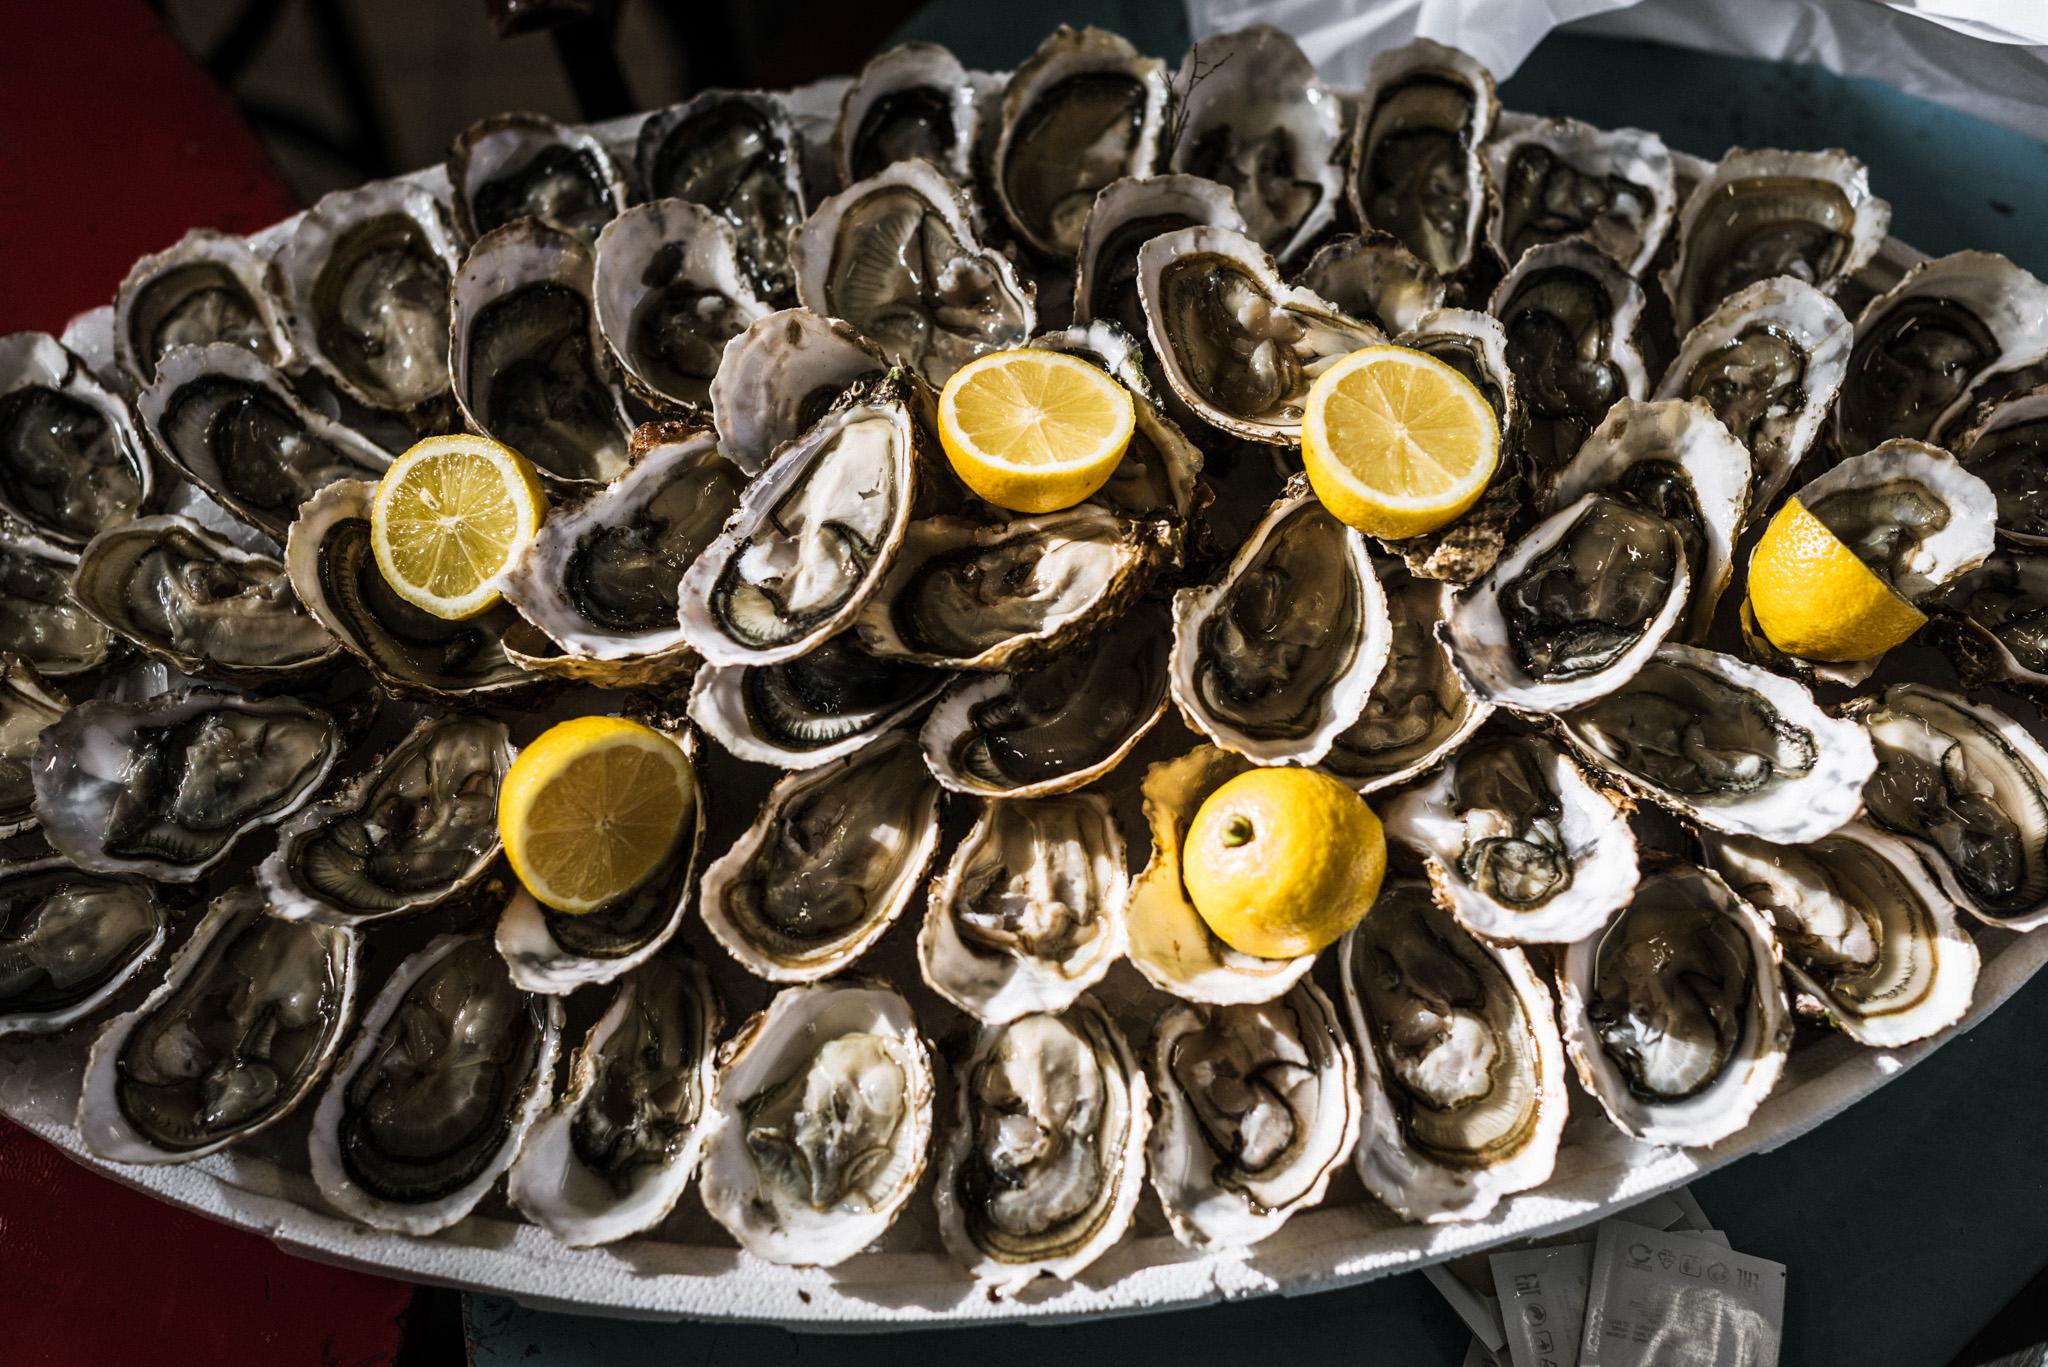 France : Languedoc : Lunchtime at Les Halles de Narbonne